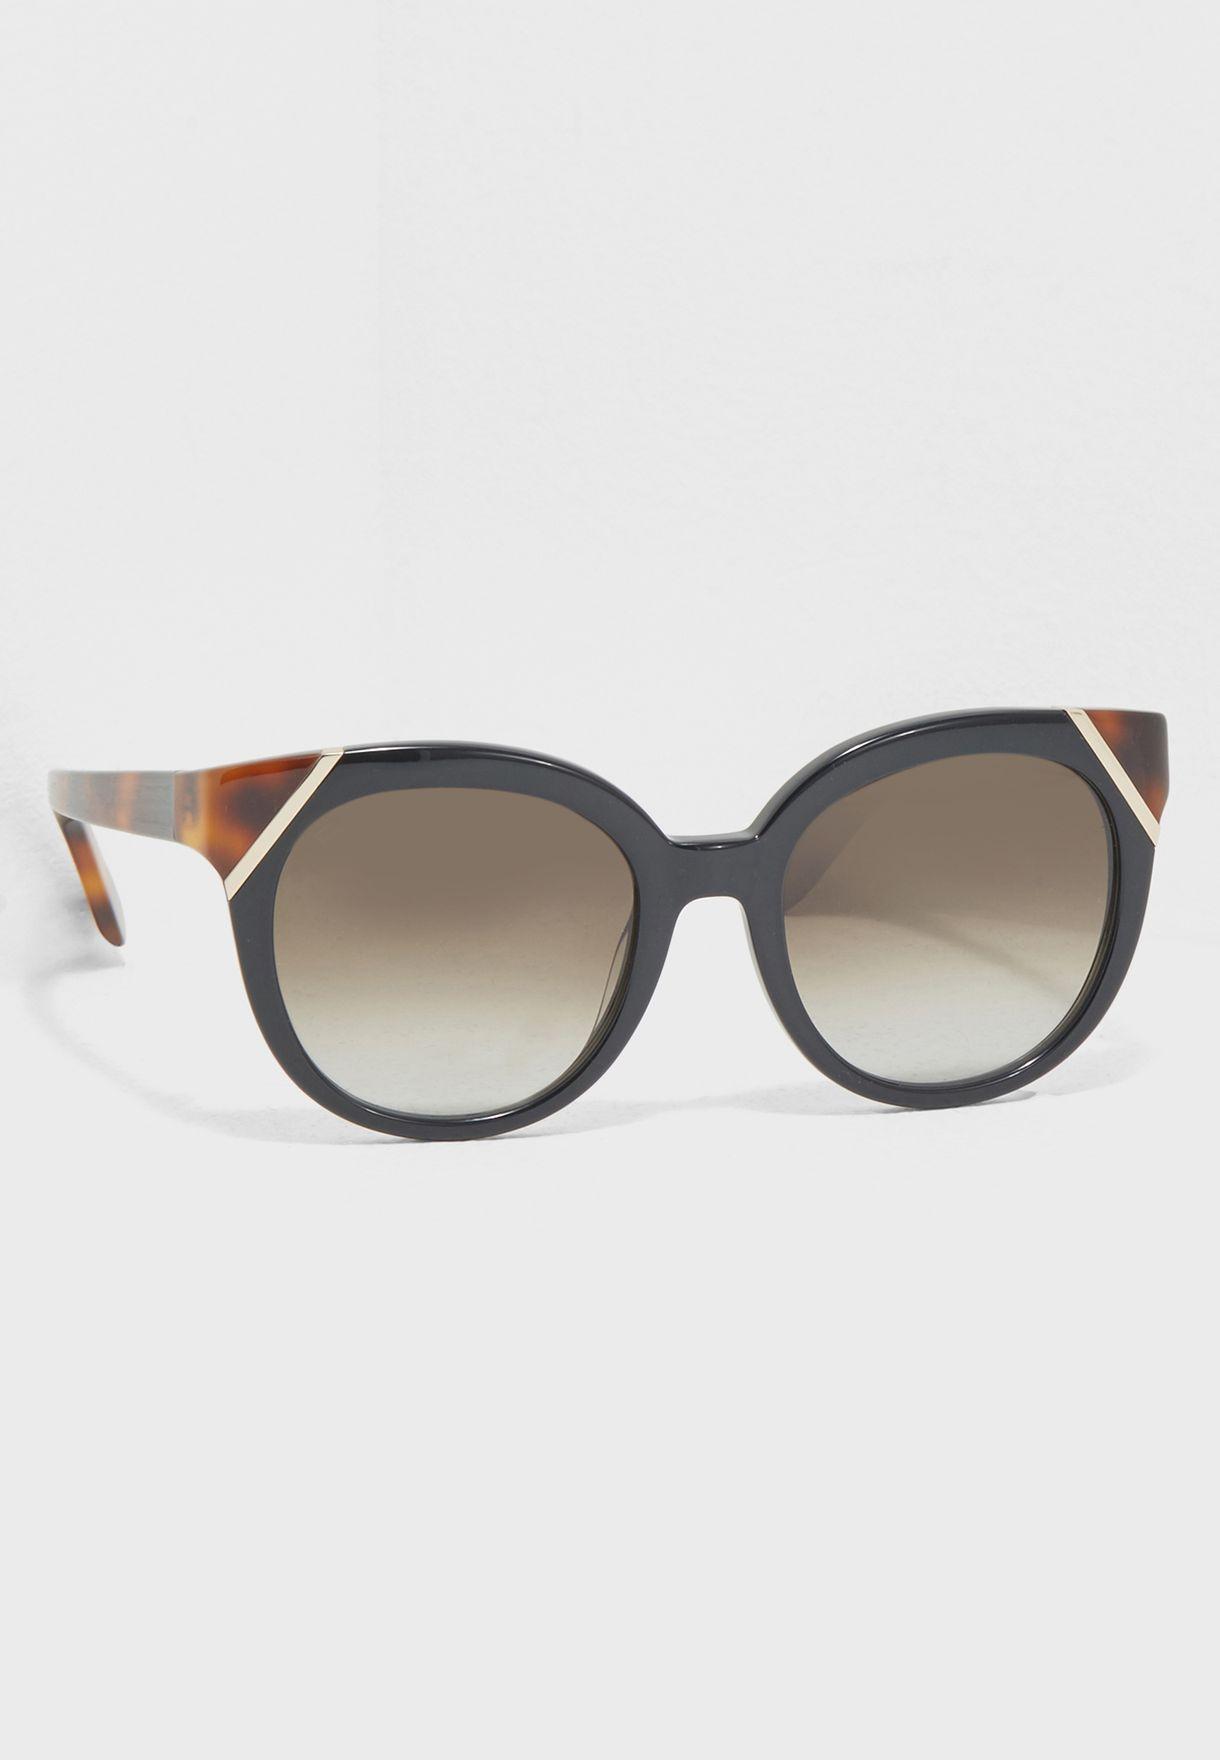 a4dd2936bd8 Shop Salvatore ferragamo black Tea Cup Sunglasses SF836S for Women in Kuwait  - SA277AC67LIU